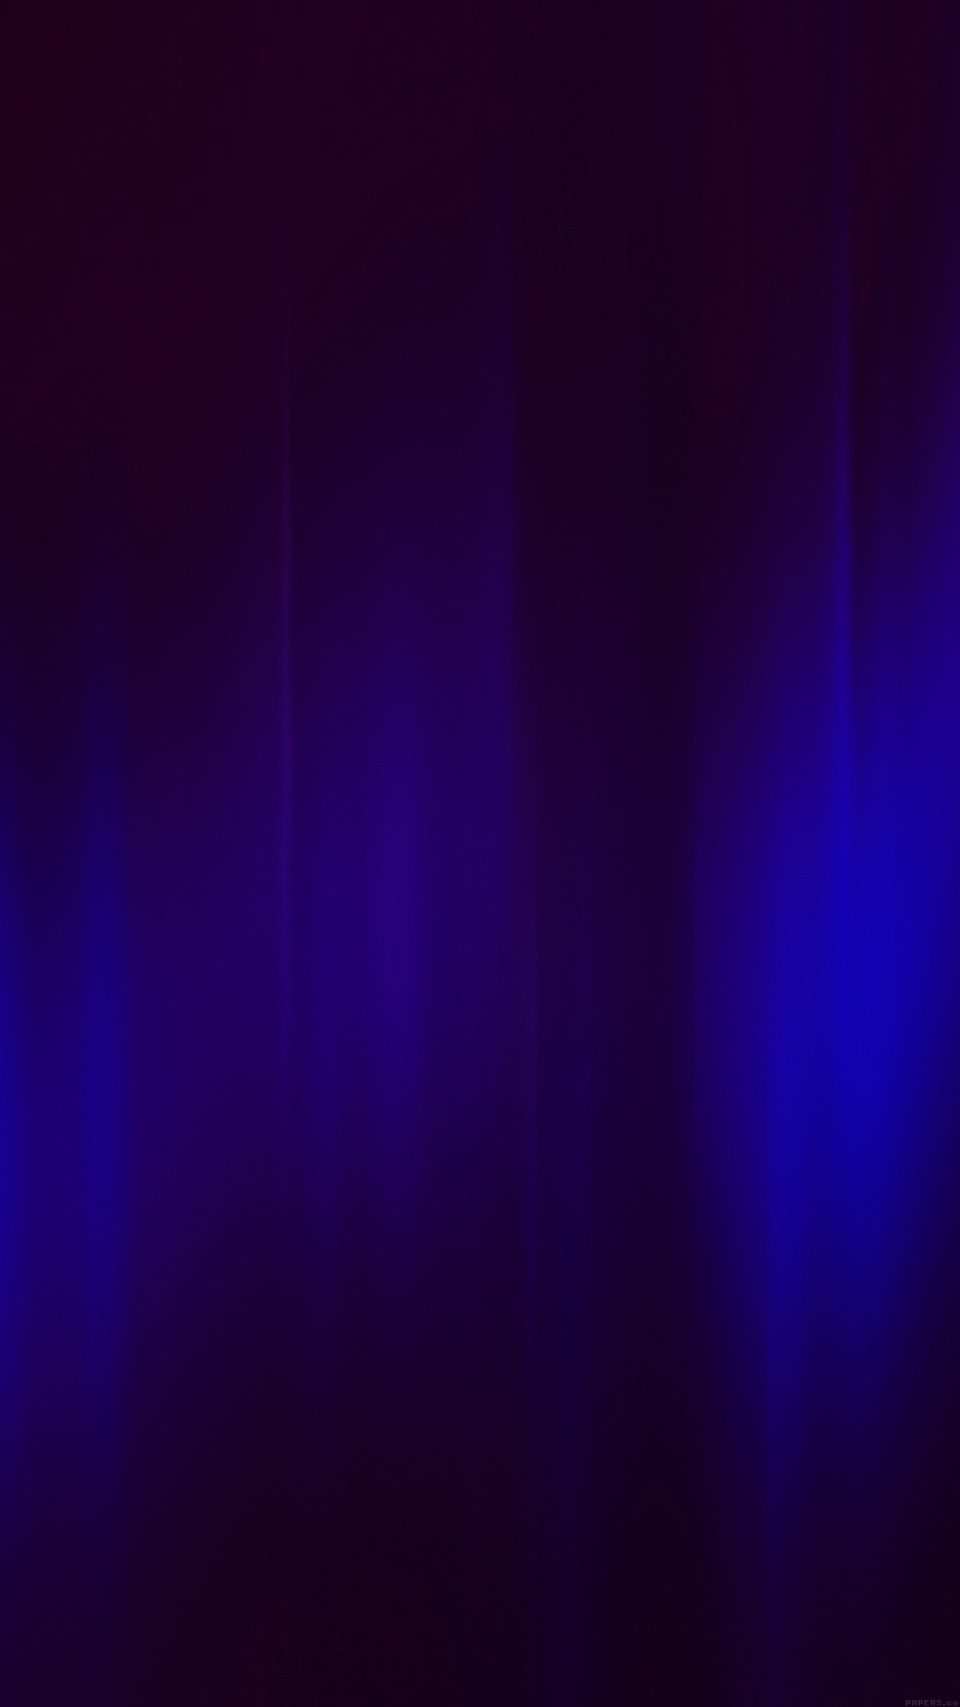 Iphone7papers Com Iphone7 Wallpaper Vi20 Retro Moden Dark Blue